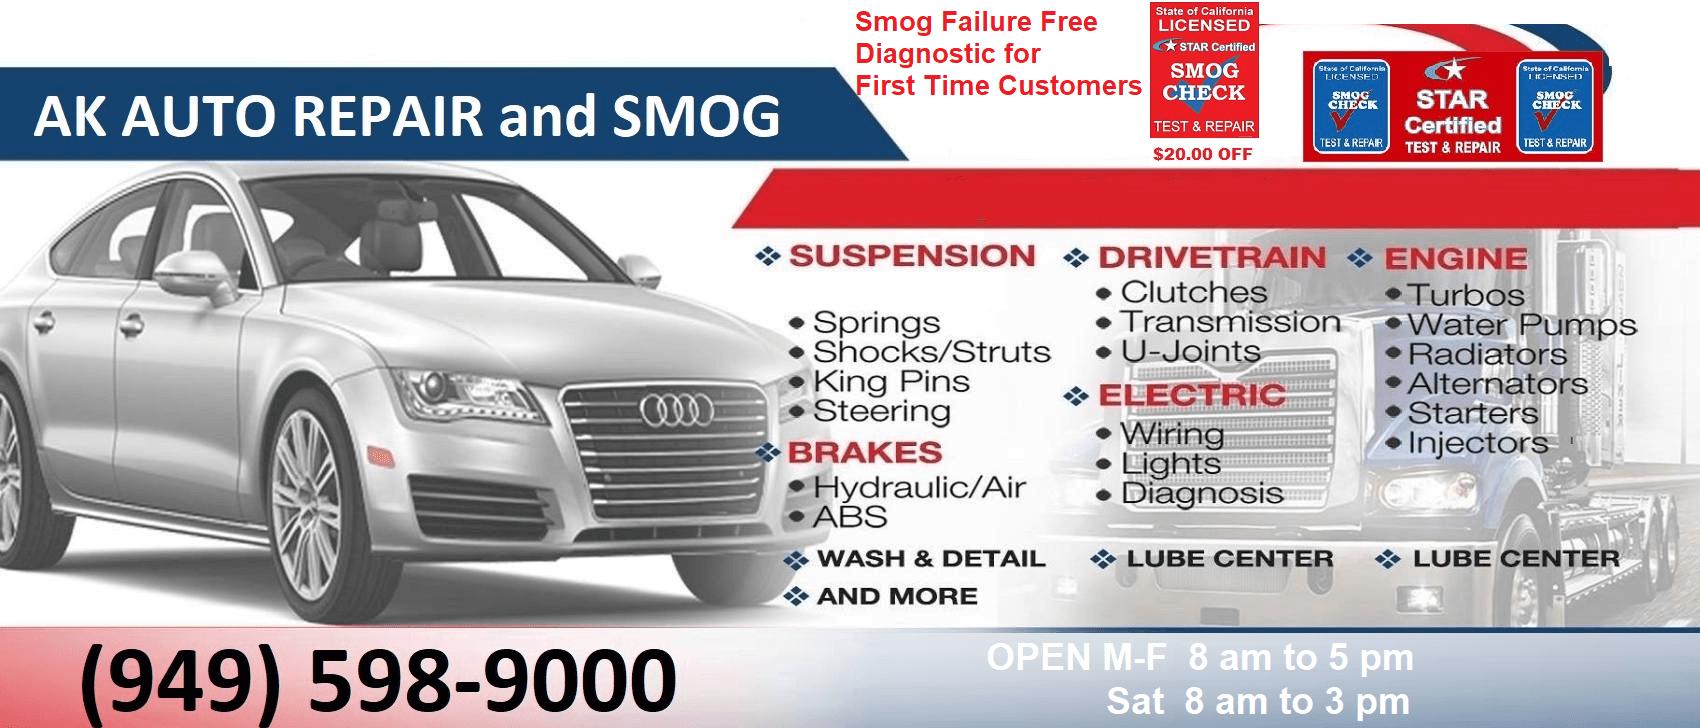 AK Auto Repair and Smog display specials ad